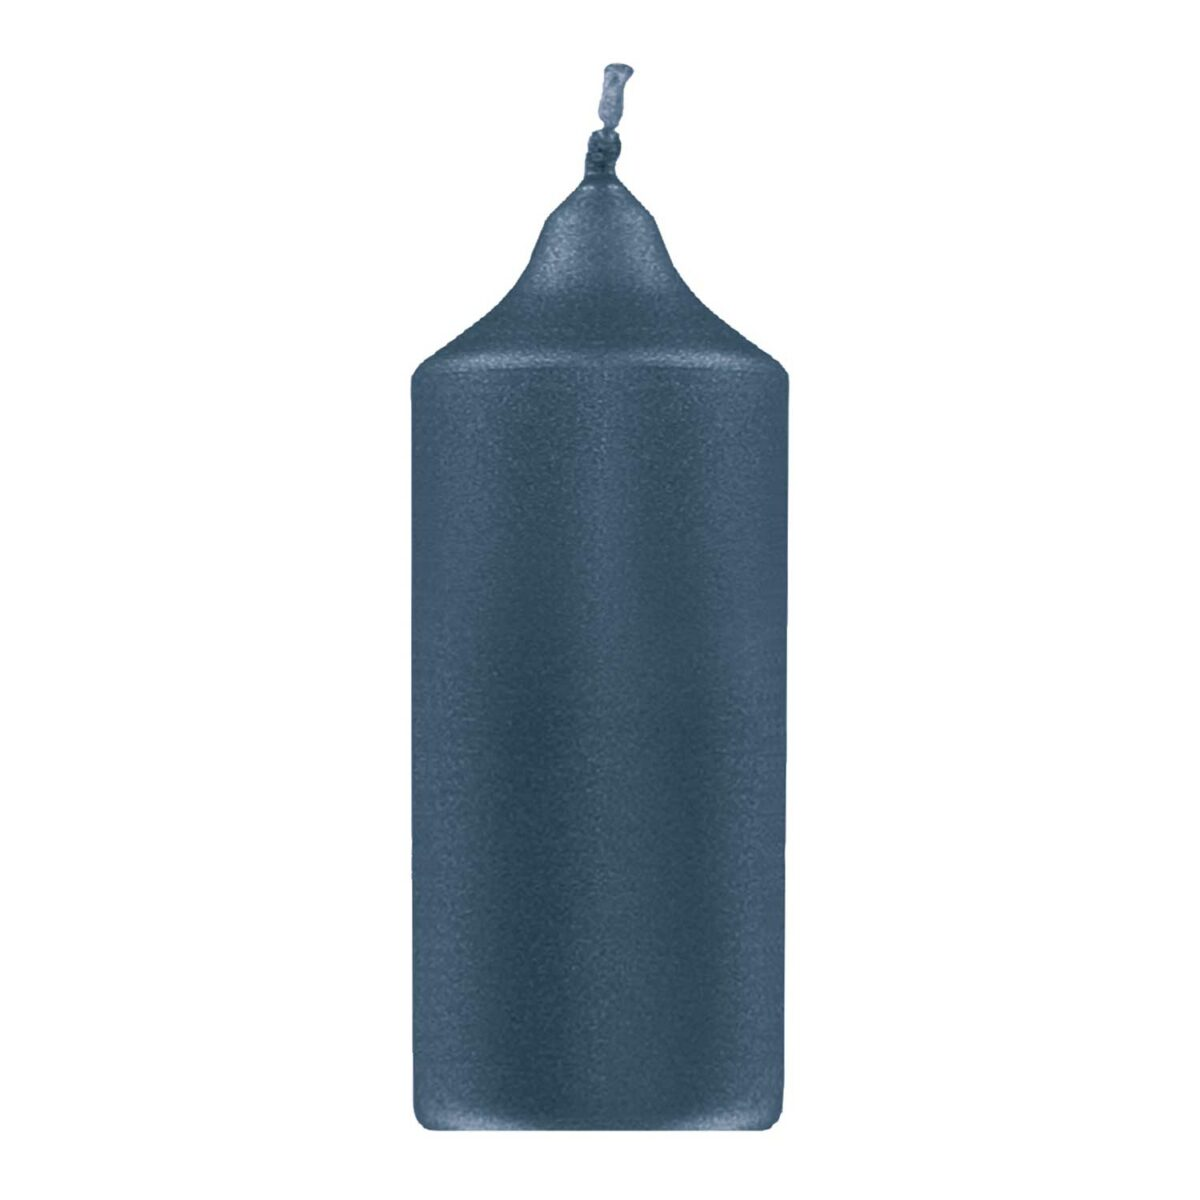 Titankerzen metallic H 12 cm | D 4 cm (12 / 24 Stück)